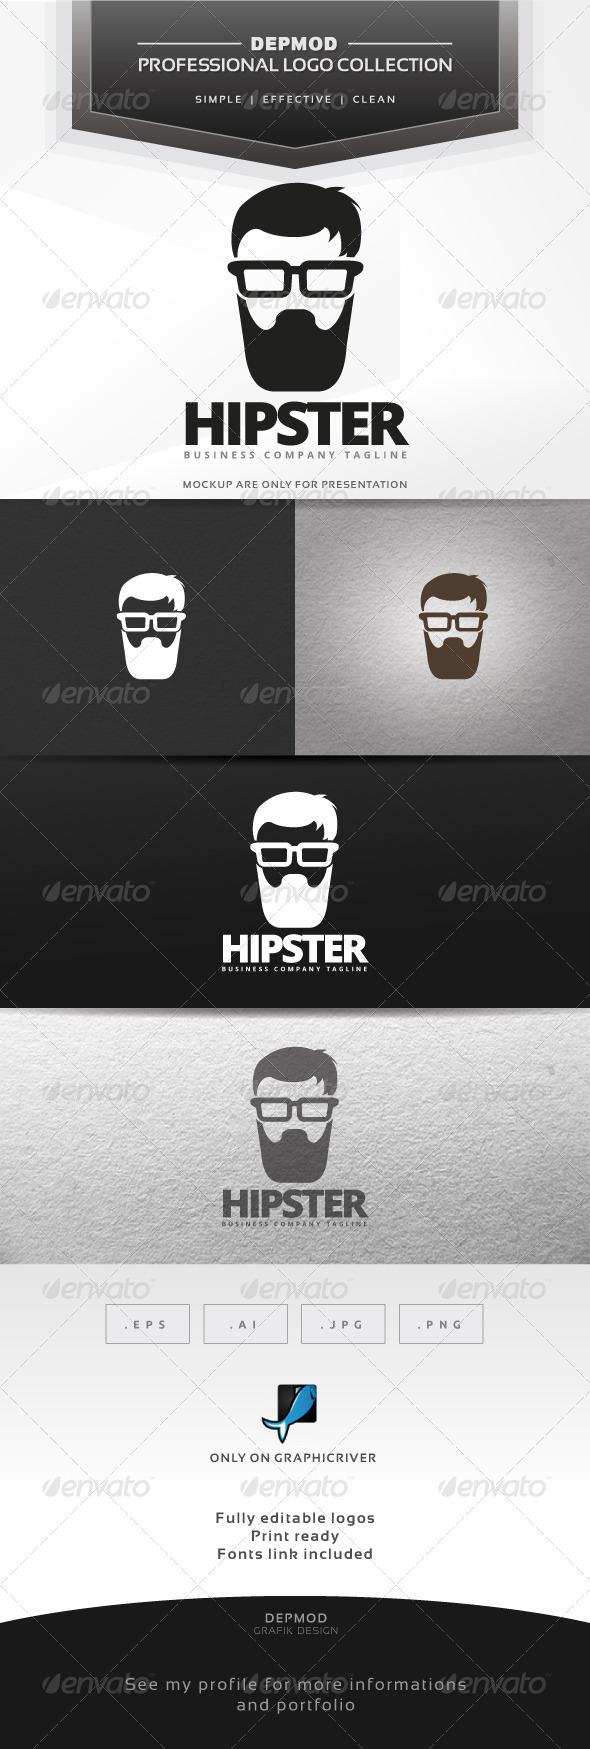 GraphicRiver Hipster Logo 7001030